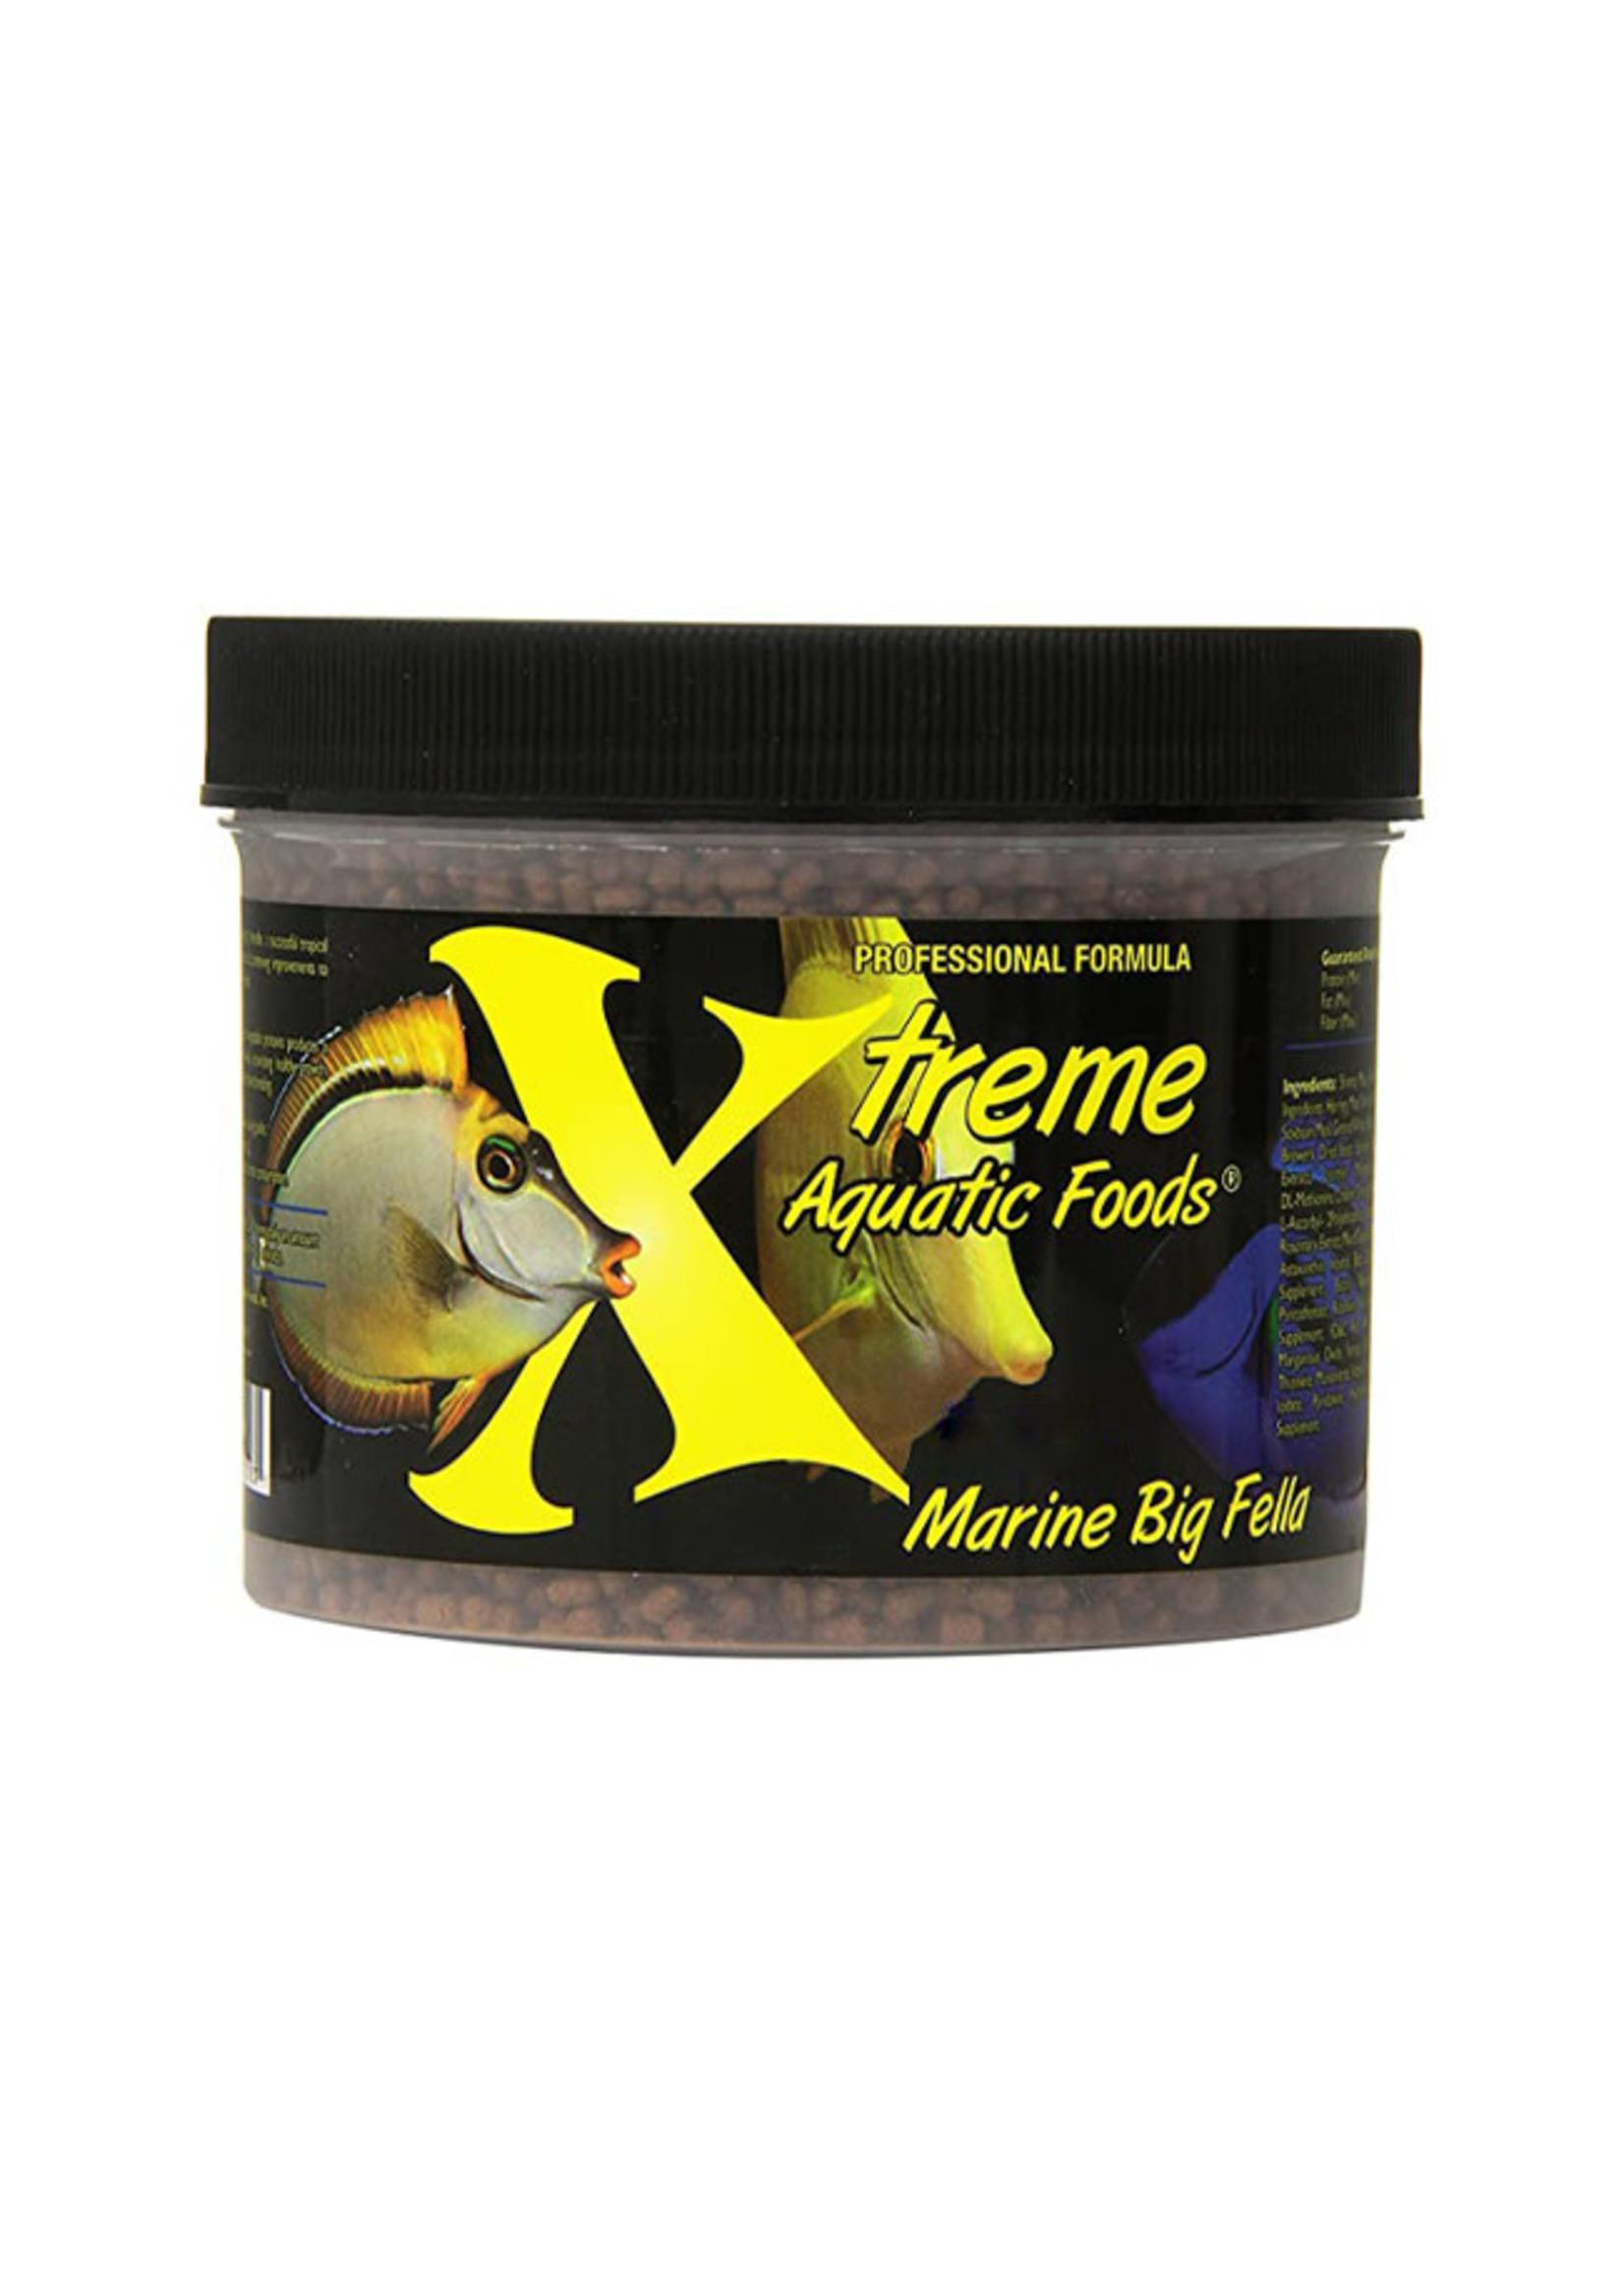 Xtreme Aquatic Foods Xtreme Marine Big Fella